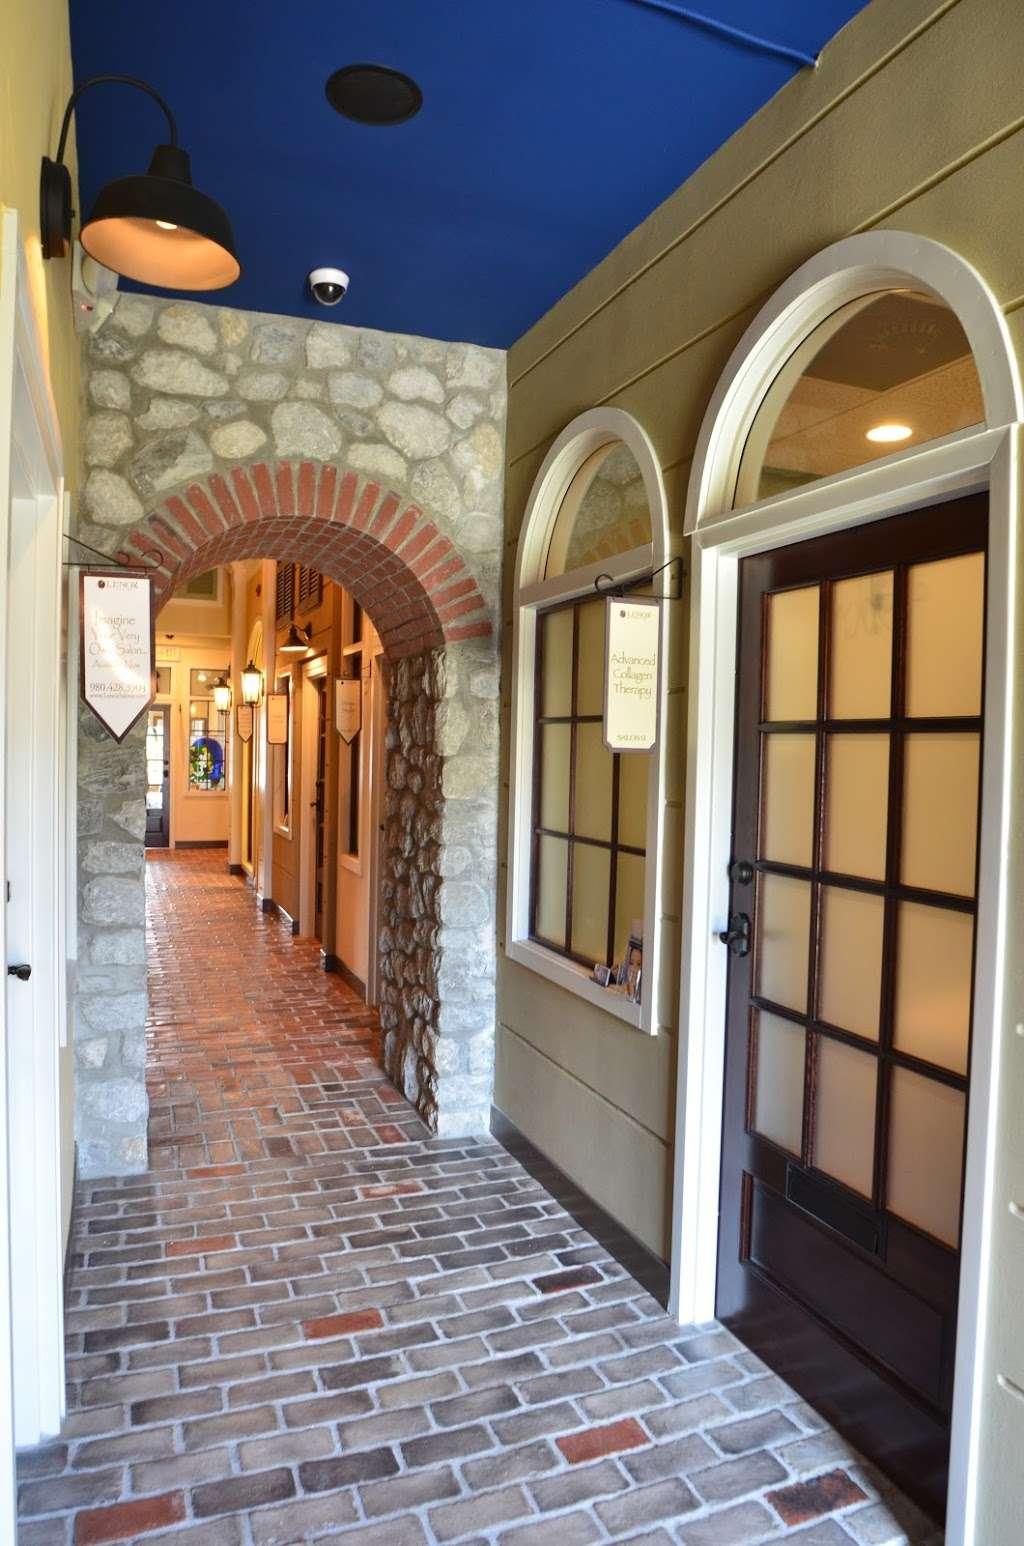 Lenox Salons - Luxury Salon Suites Huntersville, North Carolina - hair care  | Photo 8 of 10 | Address: 16623 Birkdale Commons Pkwy #130a, Huntersville, NC 28078, USA | Phone: (704) 578-2905